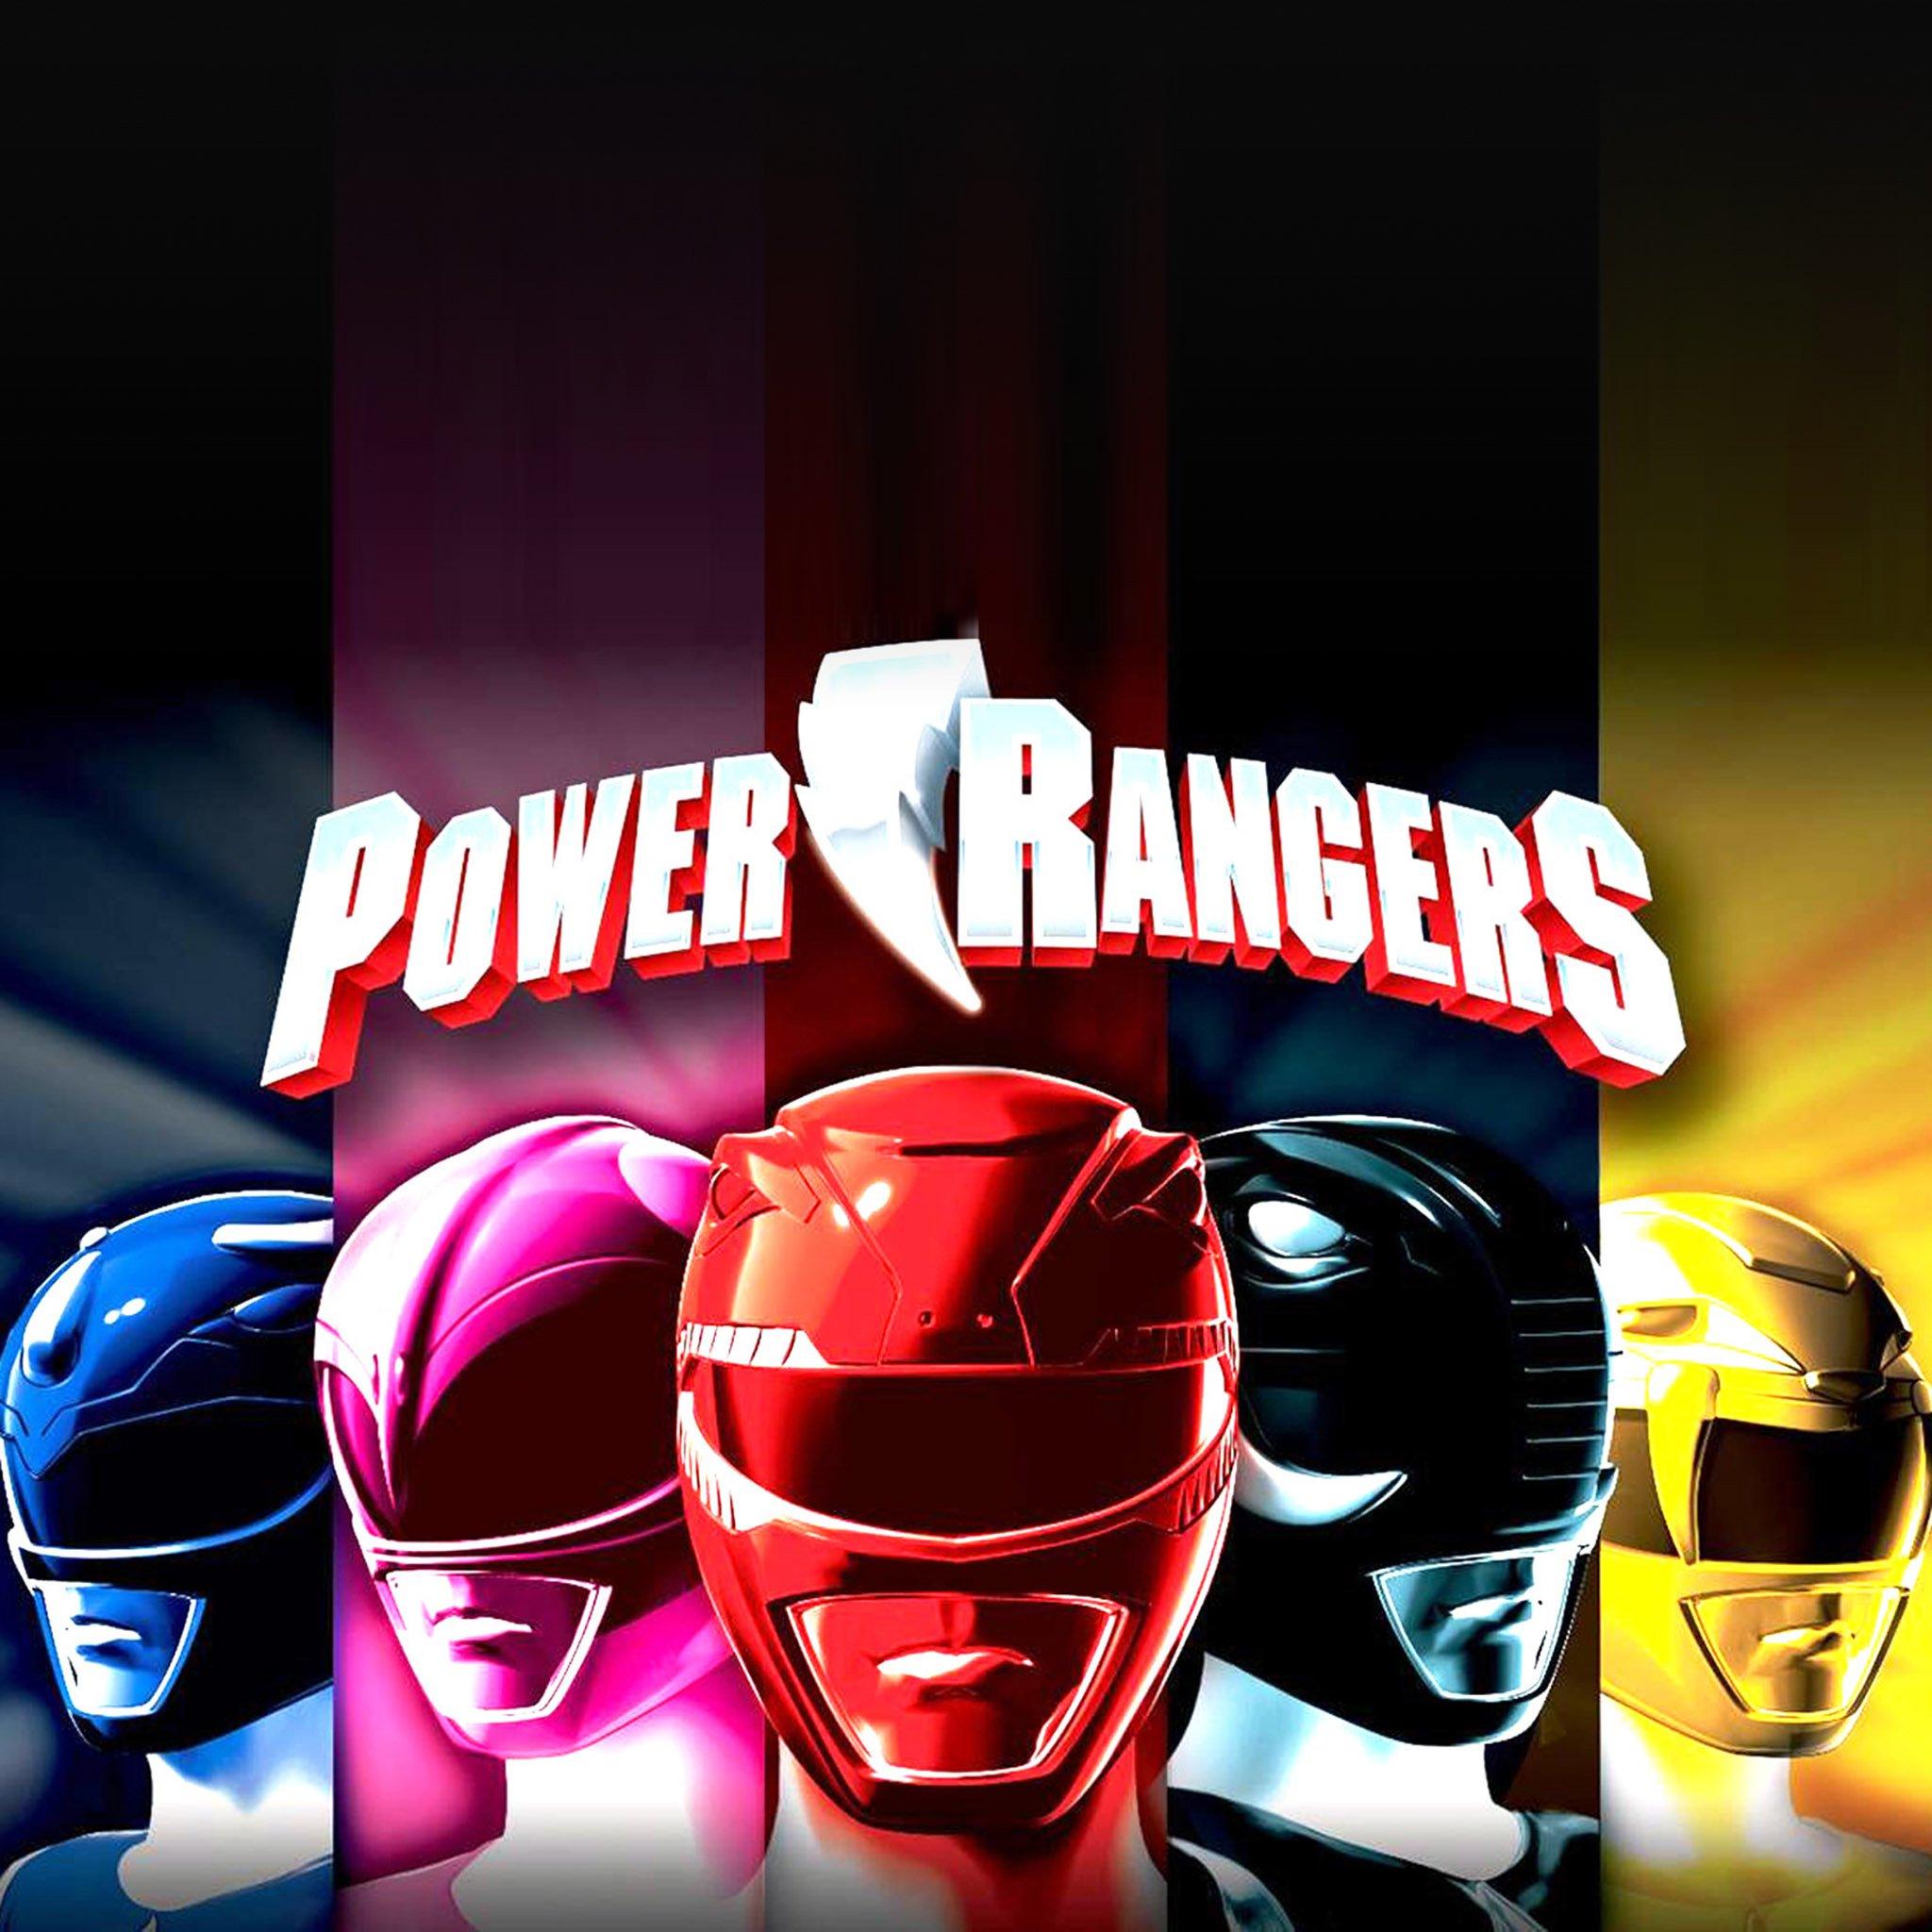 Mighty Morphin Power Rangers Wallpaper: Power Rangers Wallpaper For IPhone